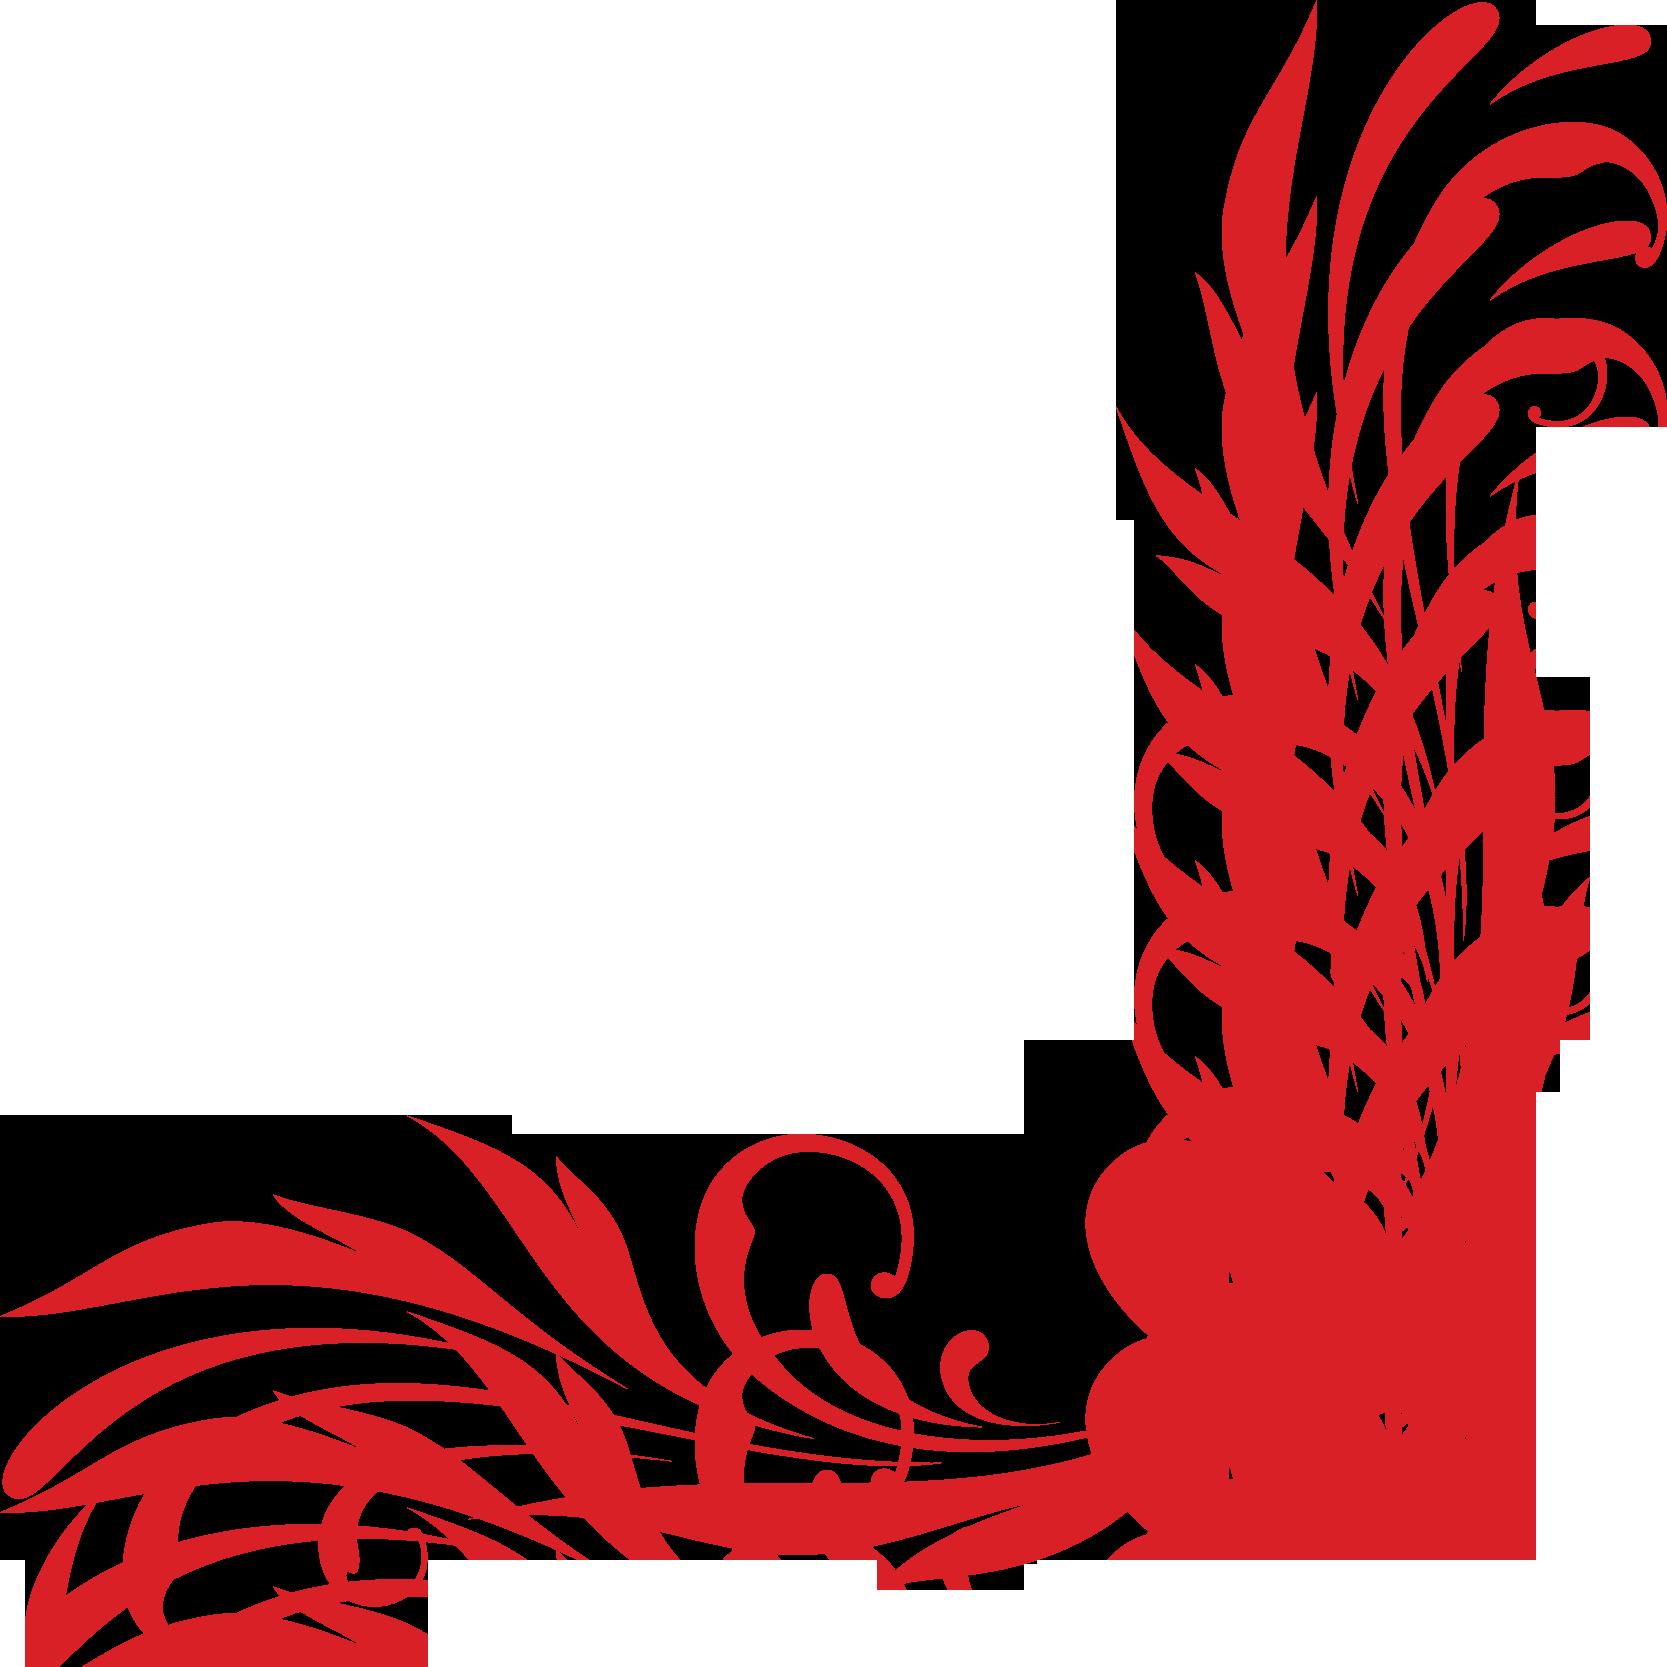 Флаг фон красный